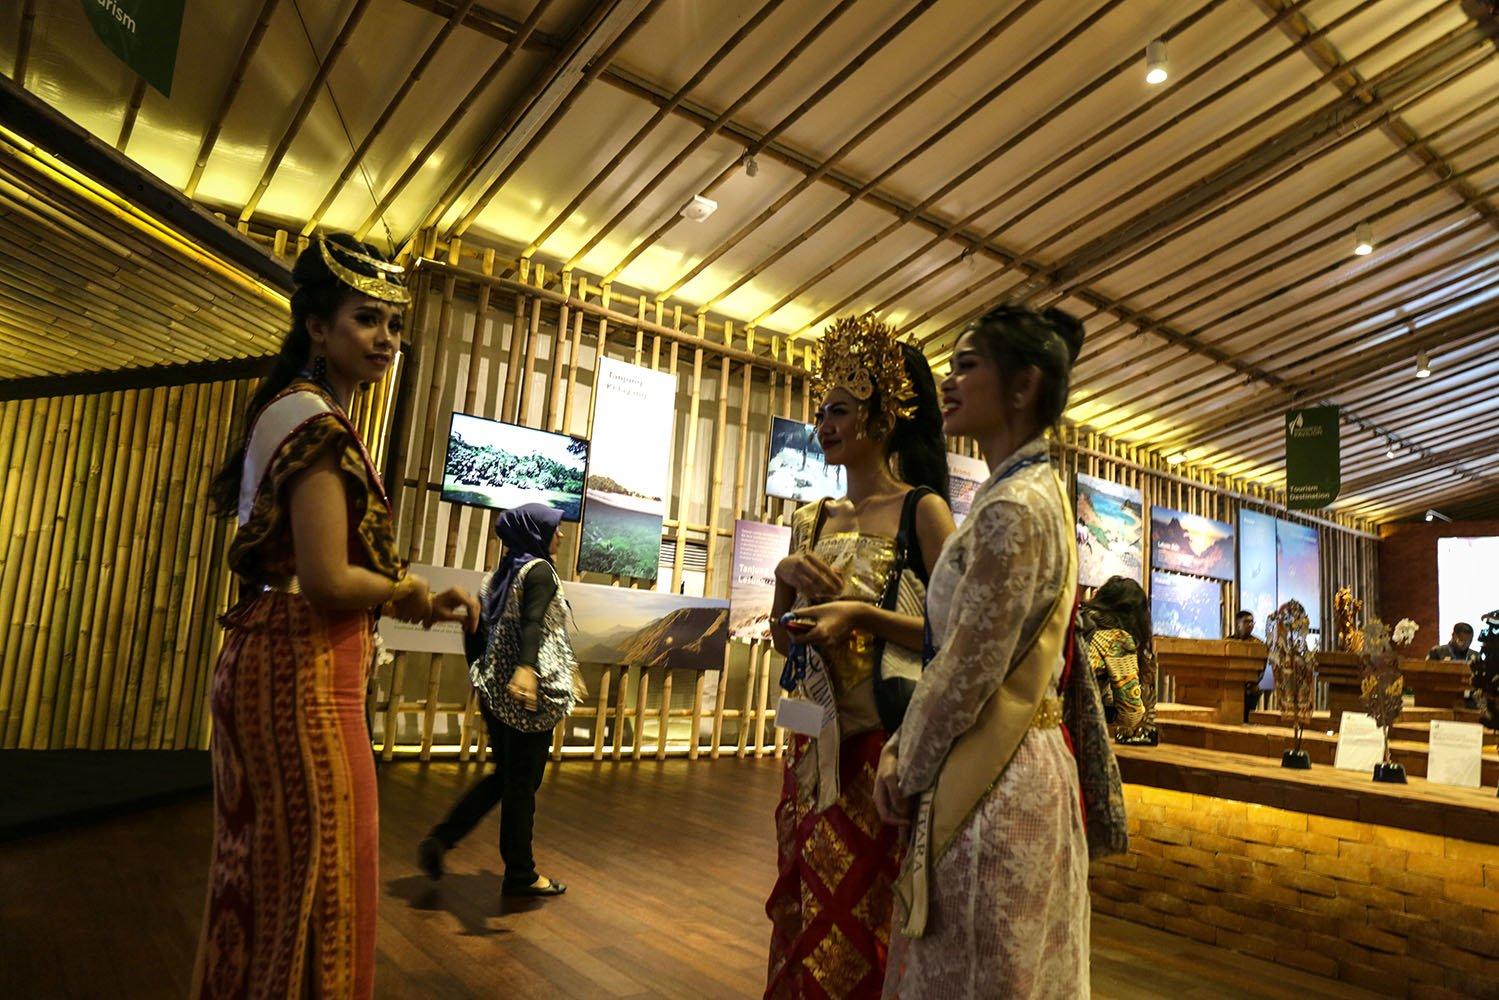 Tiga wanita pemandu Indonesia Pavilion sedang berbincang dalam pameran Indonesia Pavillion, NUsa Dua, Bali (9/10)